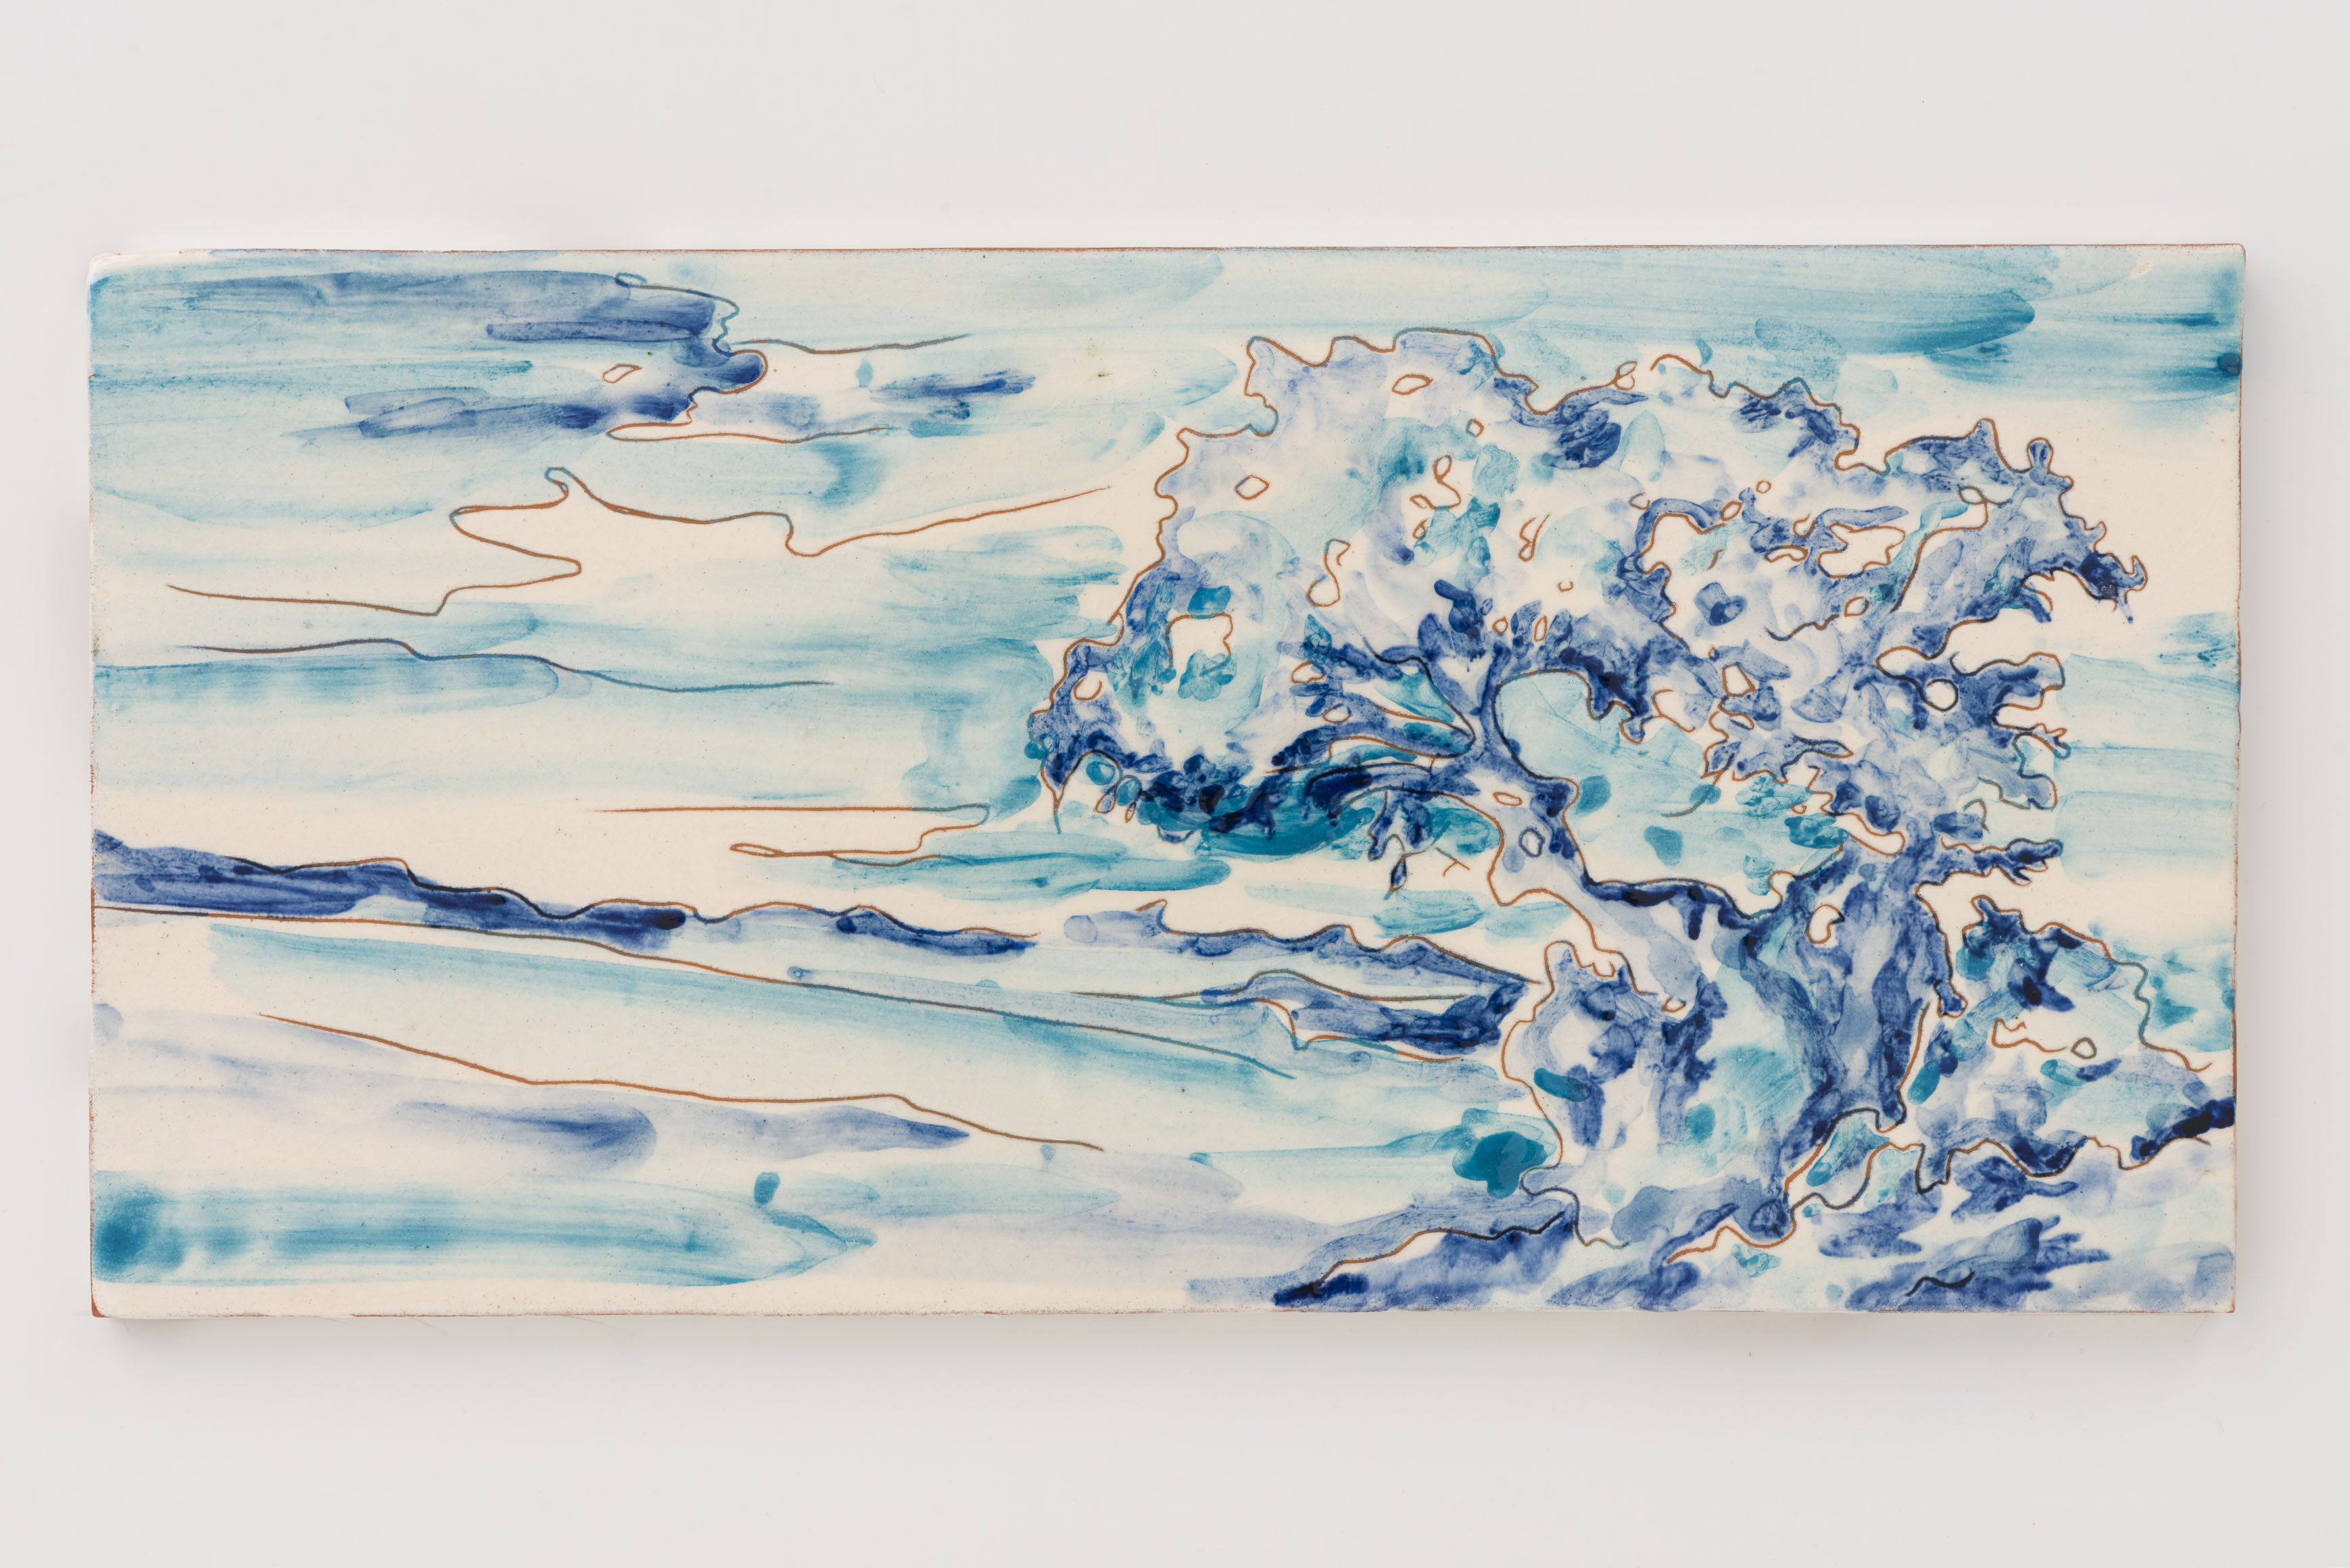 """Memorias Alentejana VI"" 14,5 x 29 cm. painted ceramic tile Portugal 2014"